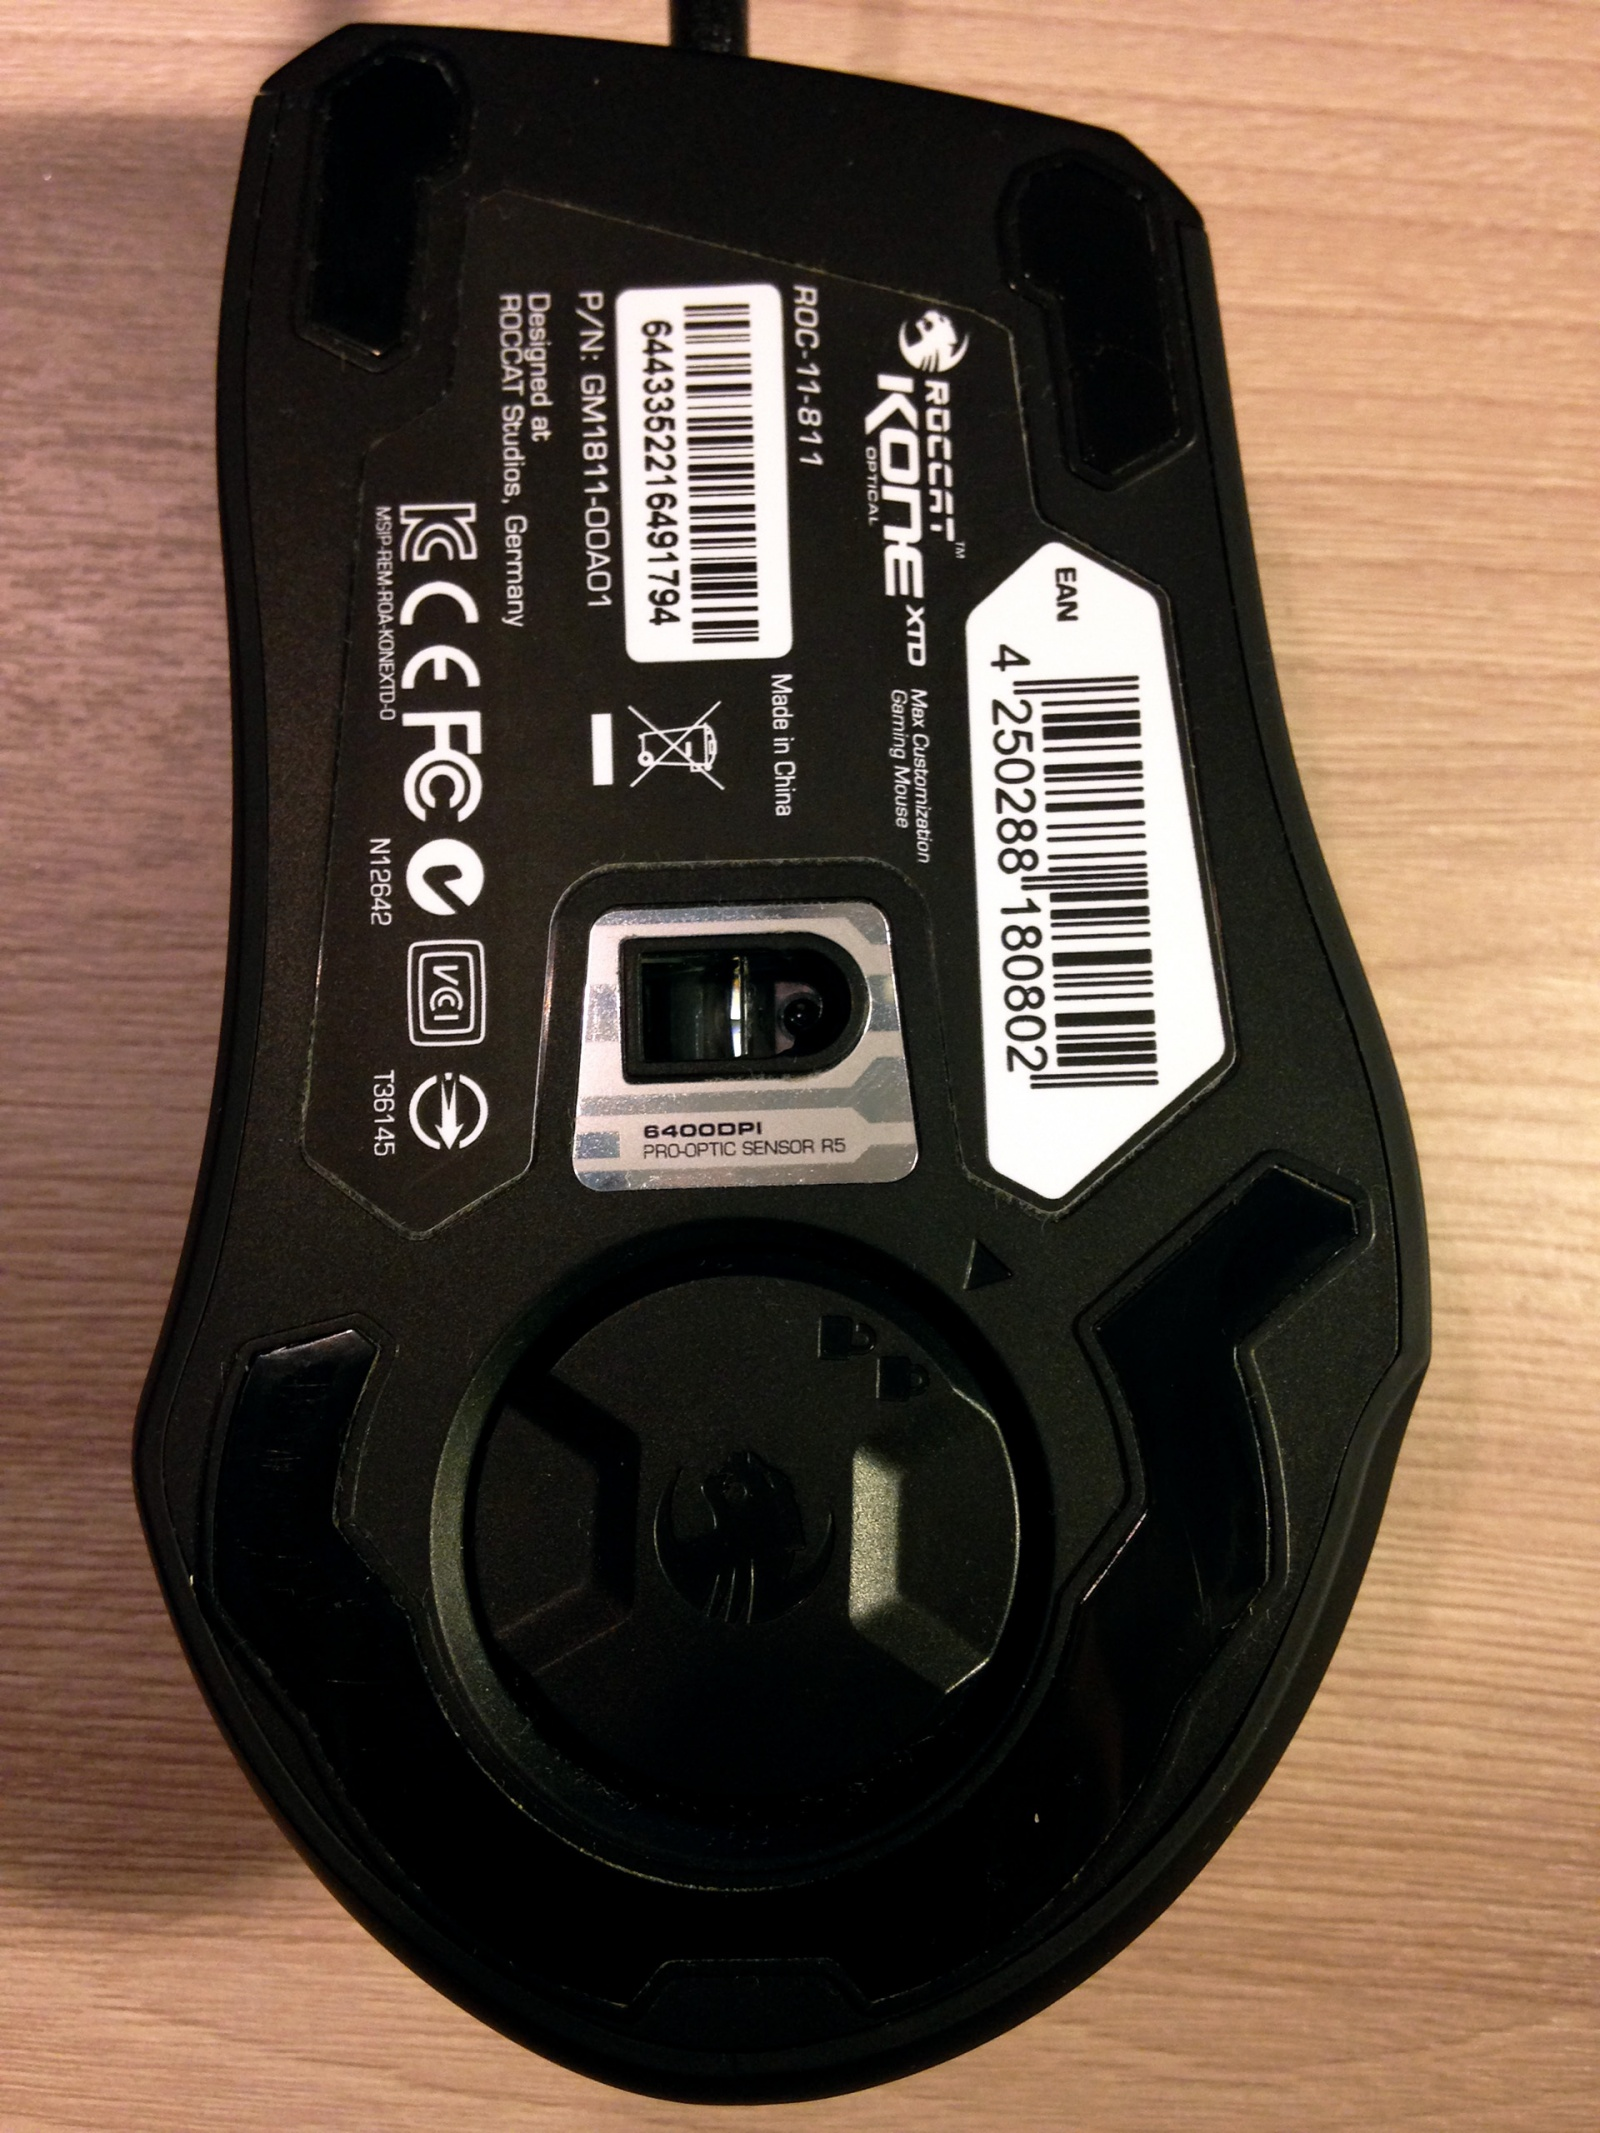 Мышки топ-сегмента – Roccat Kone XTD и Roccat Kone XTD Optical - 17